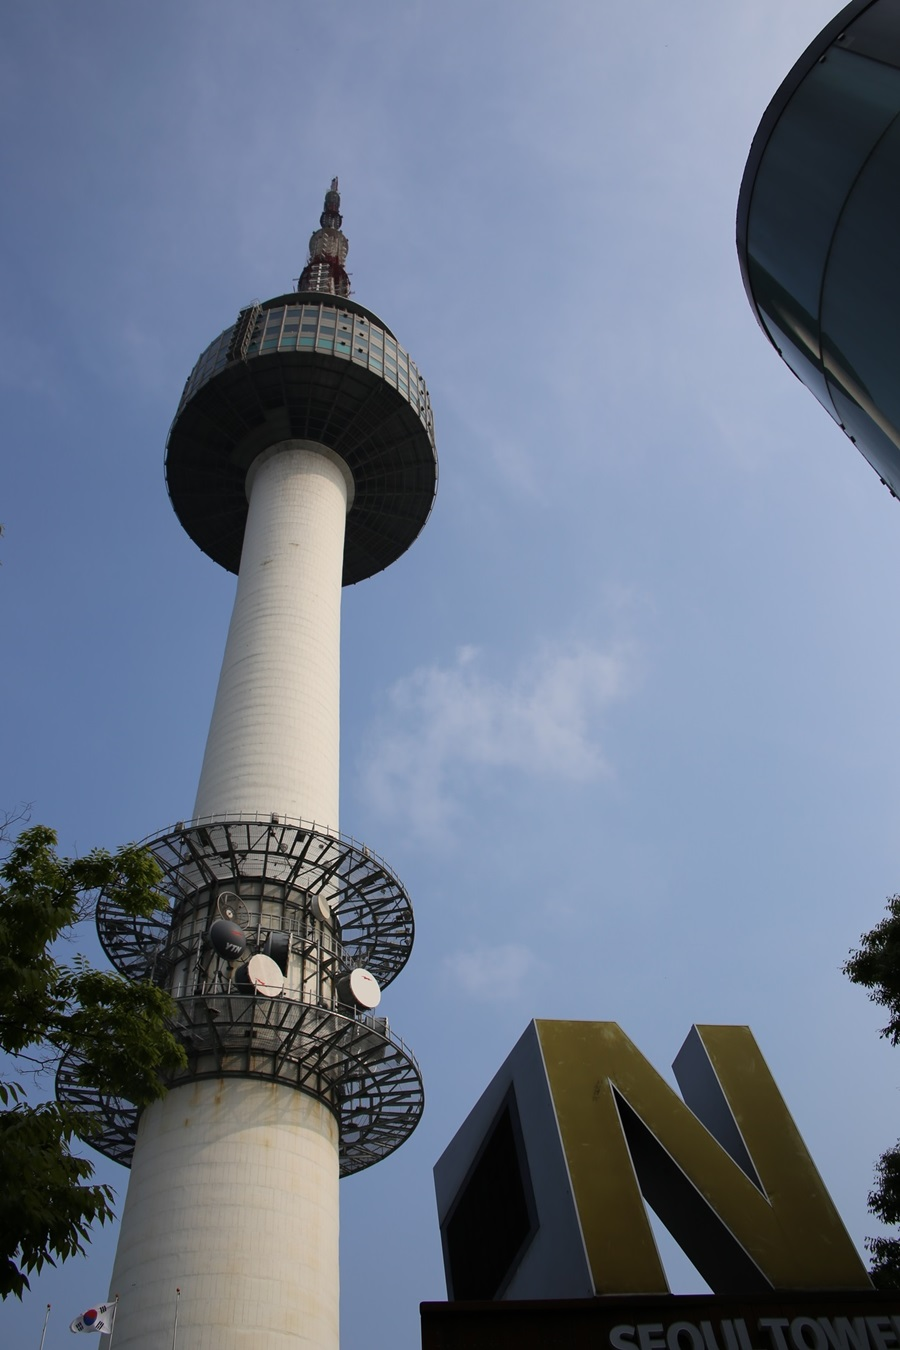 Nソウルタワー真下 南山 Namsan and N-Seoul-tower (8)